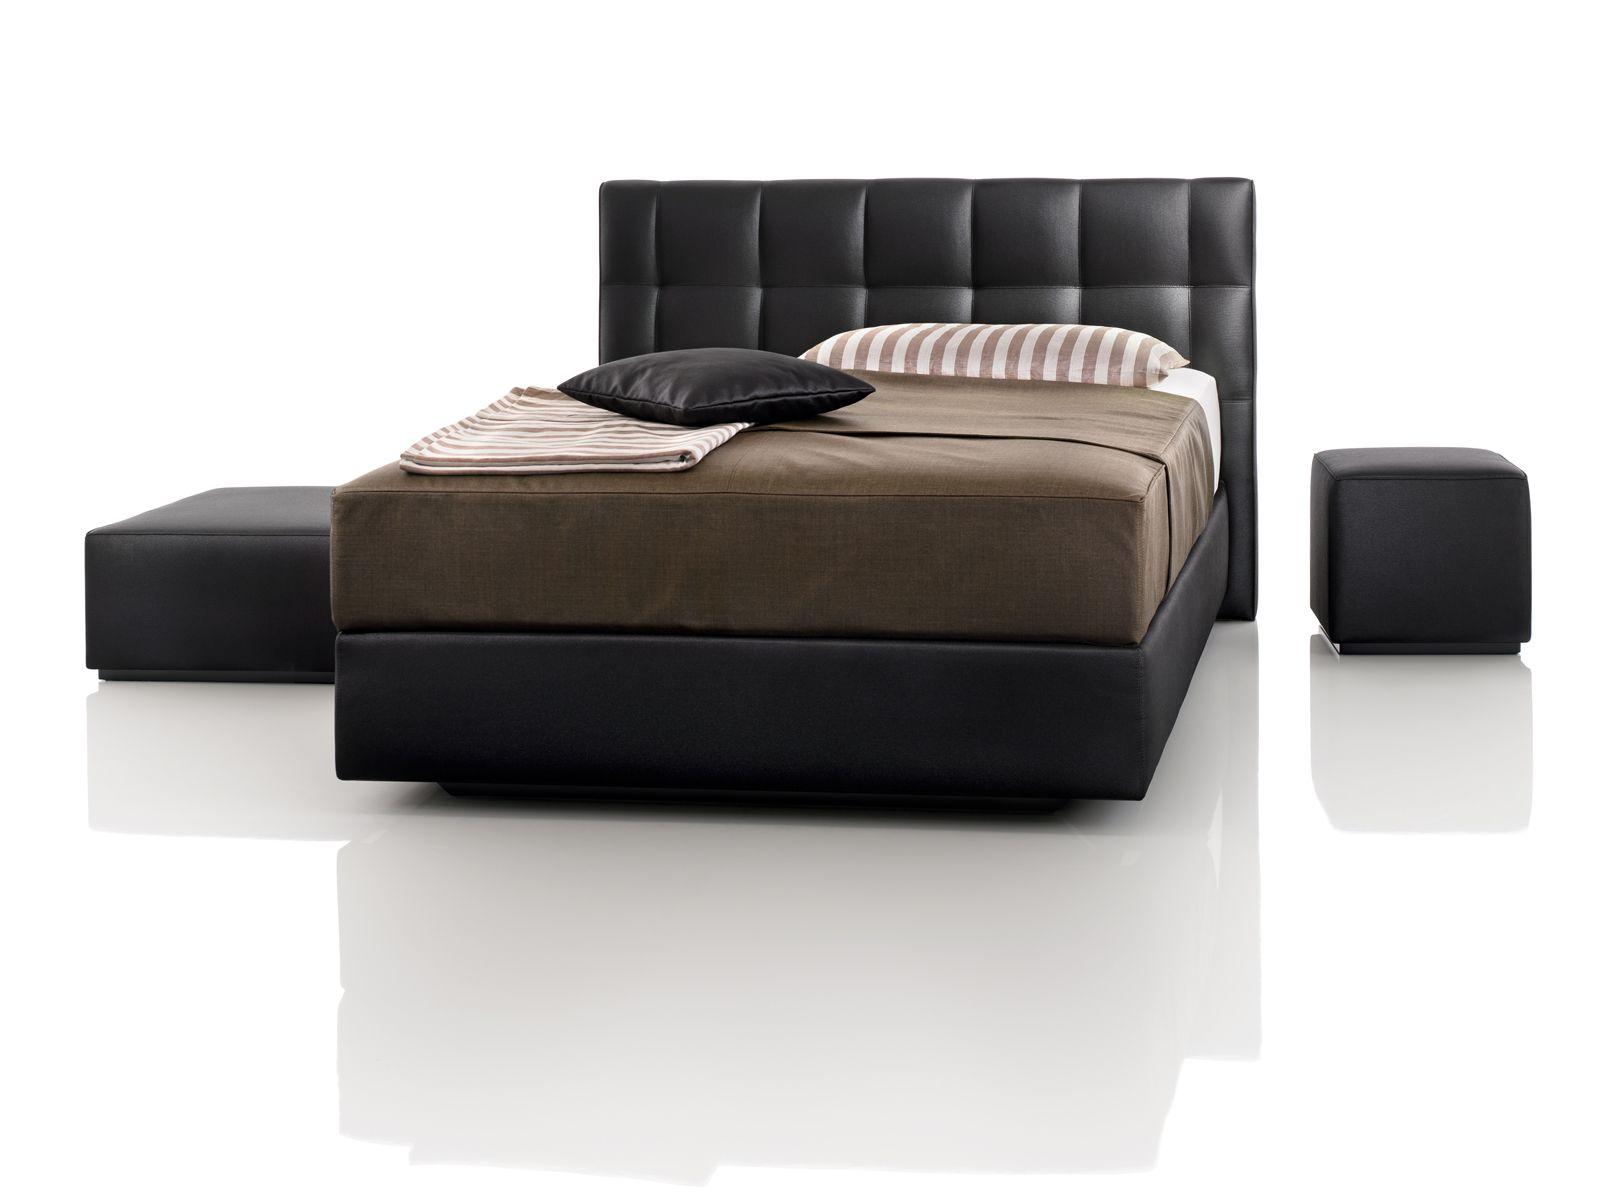 doppelbett somnus iv by wittmann. Black Bedroom Furniture Sets. Home Design Ideas